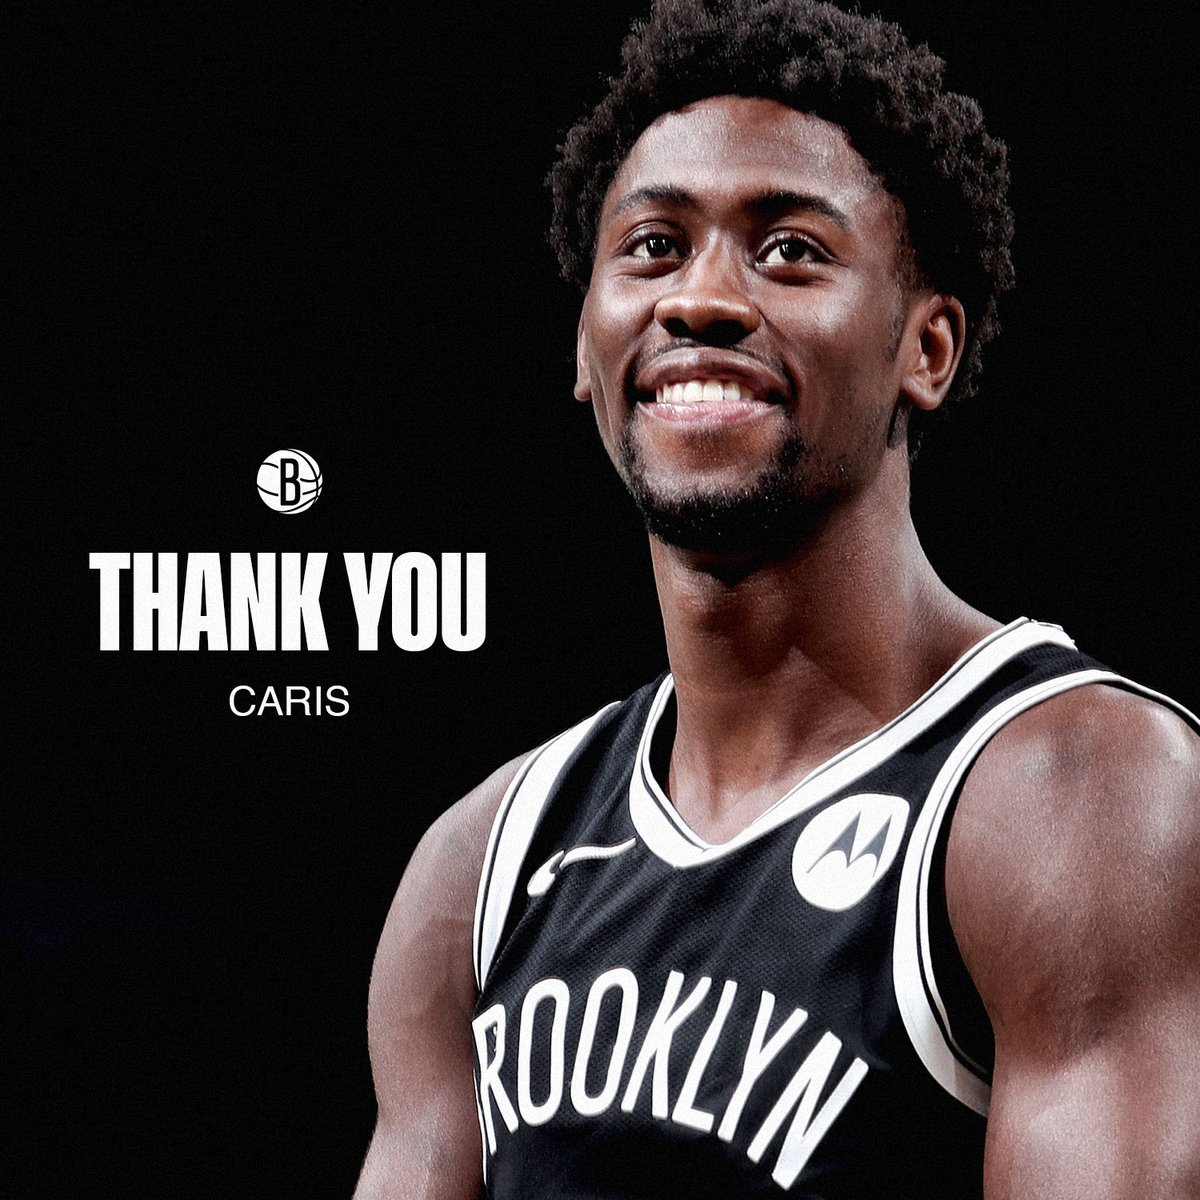 Thank you, Caris. https://t.co/CInoqjebZV